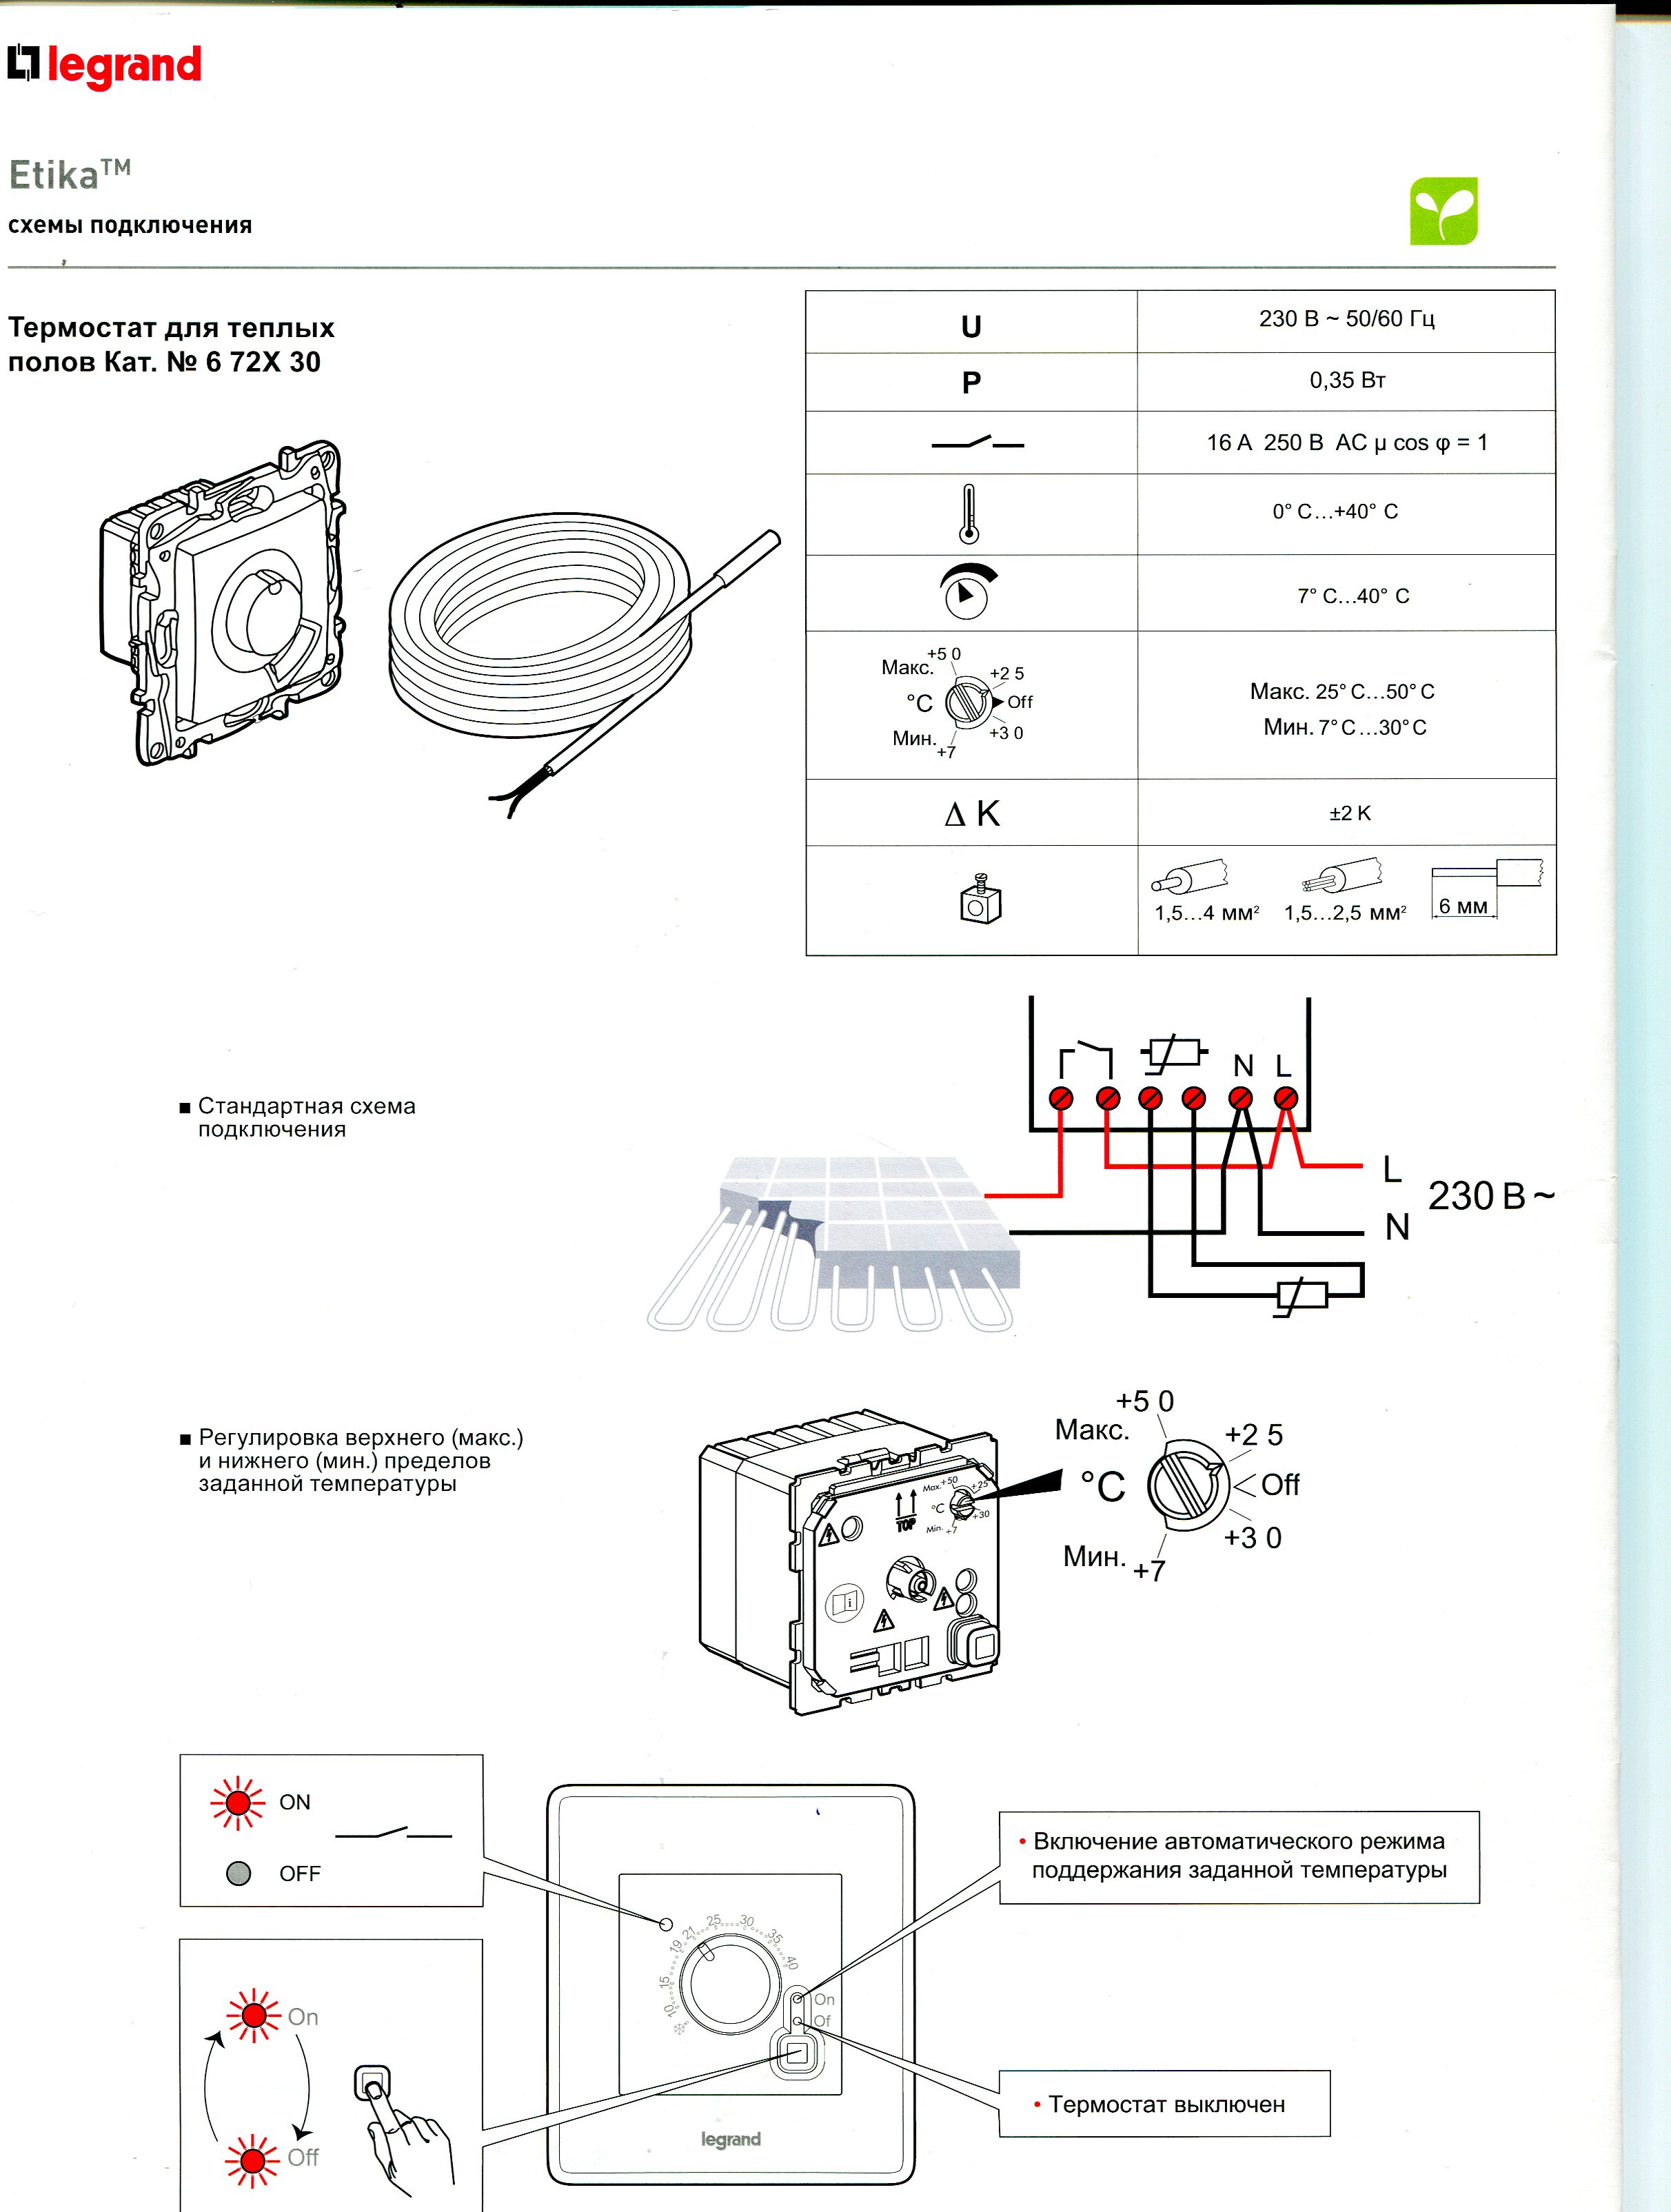 Подключение регулятора теплого пола легранд схема подключения